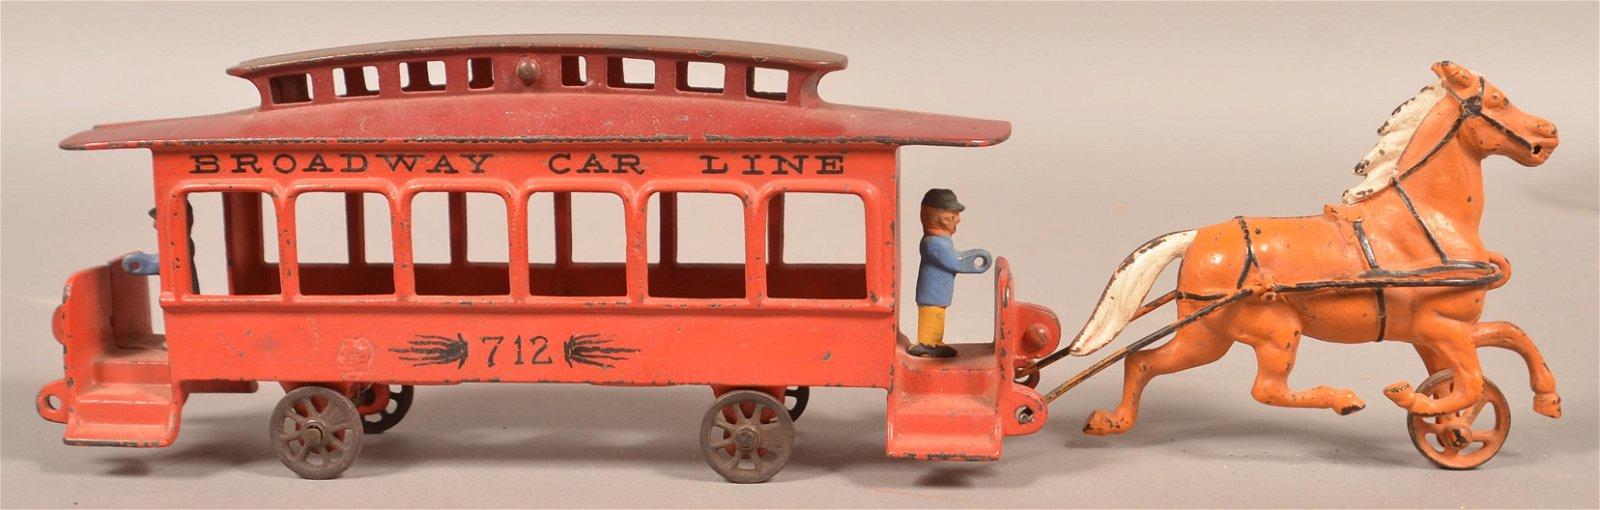 "Cast Iron ""Broadway Car Line 712"" Street Car Toy."